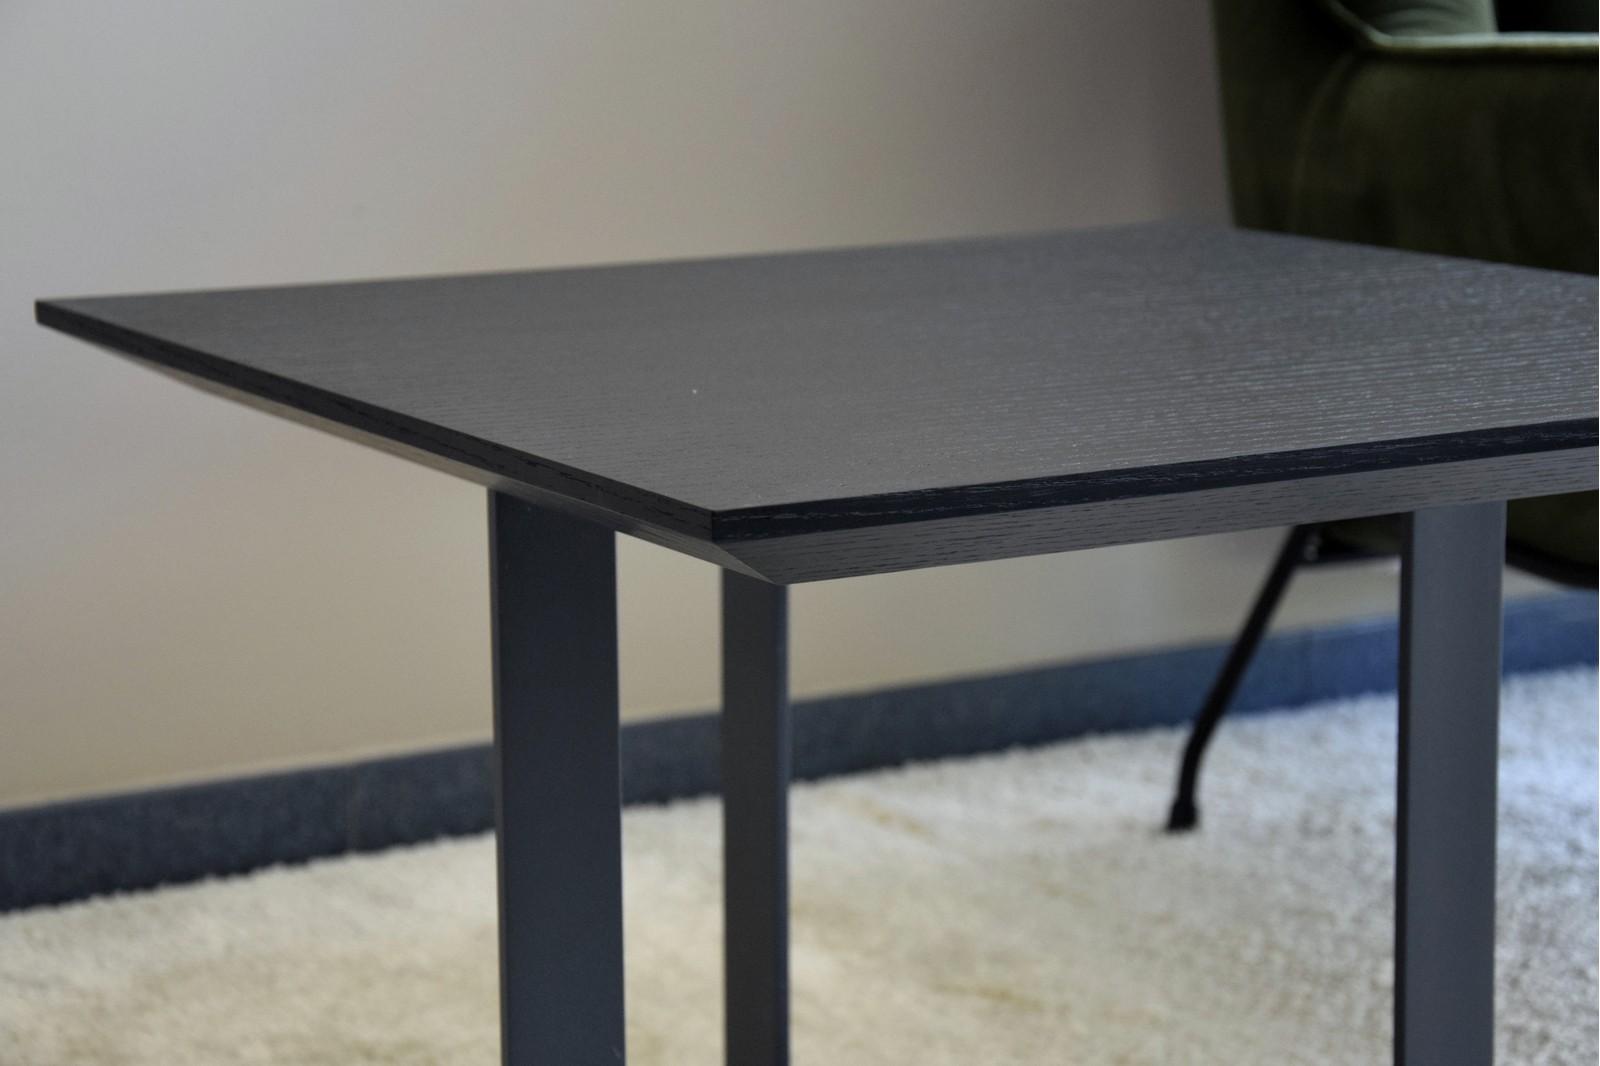 SQUARE SIDE TABLE. MATT BLACK OAK VENEER AND METAL